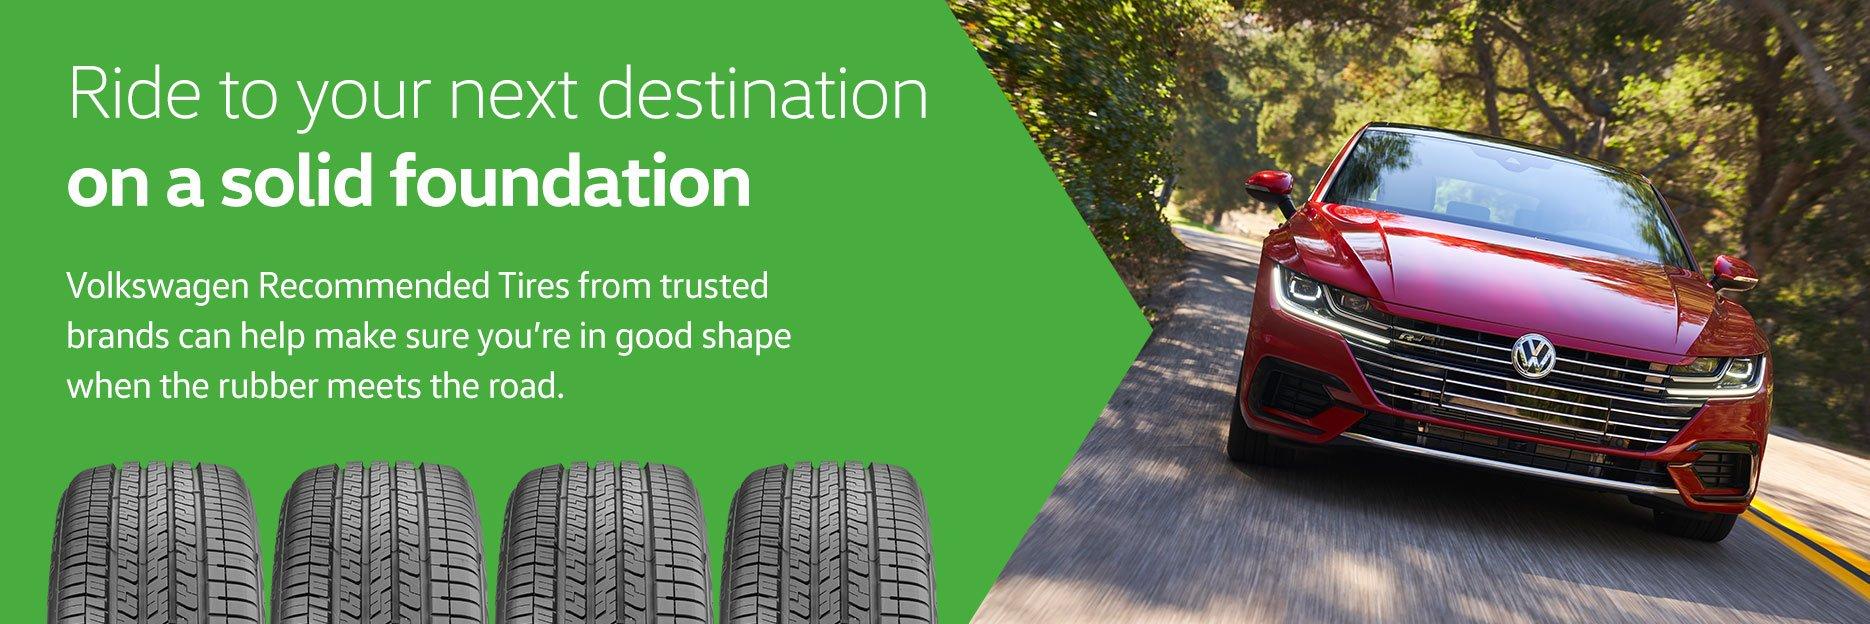 Ride to your next destination